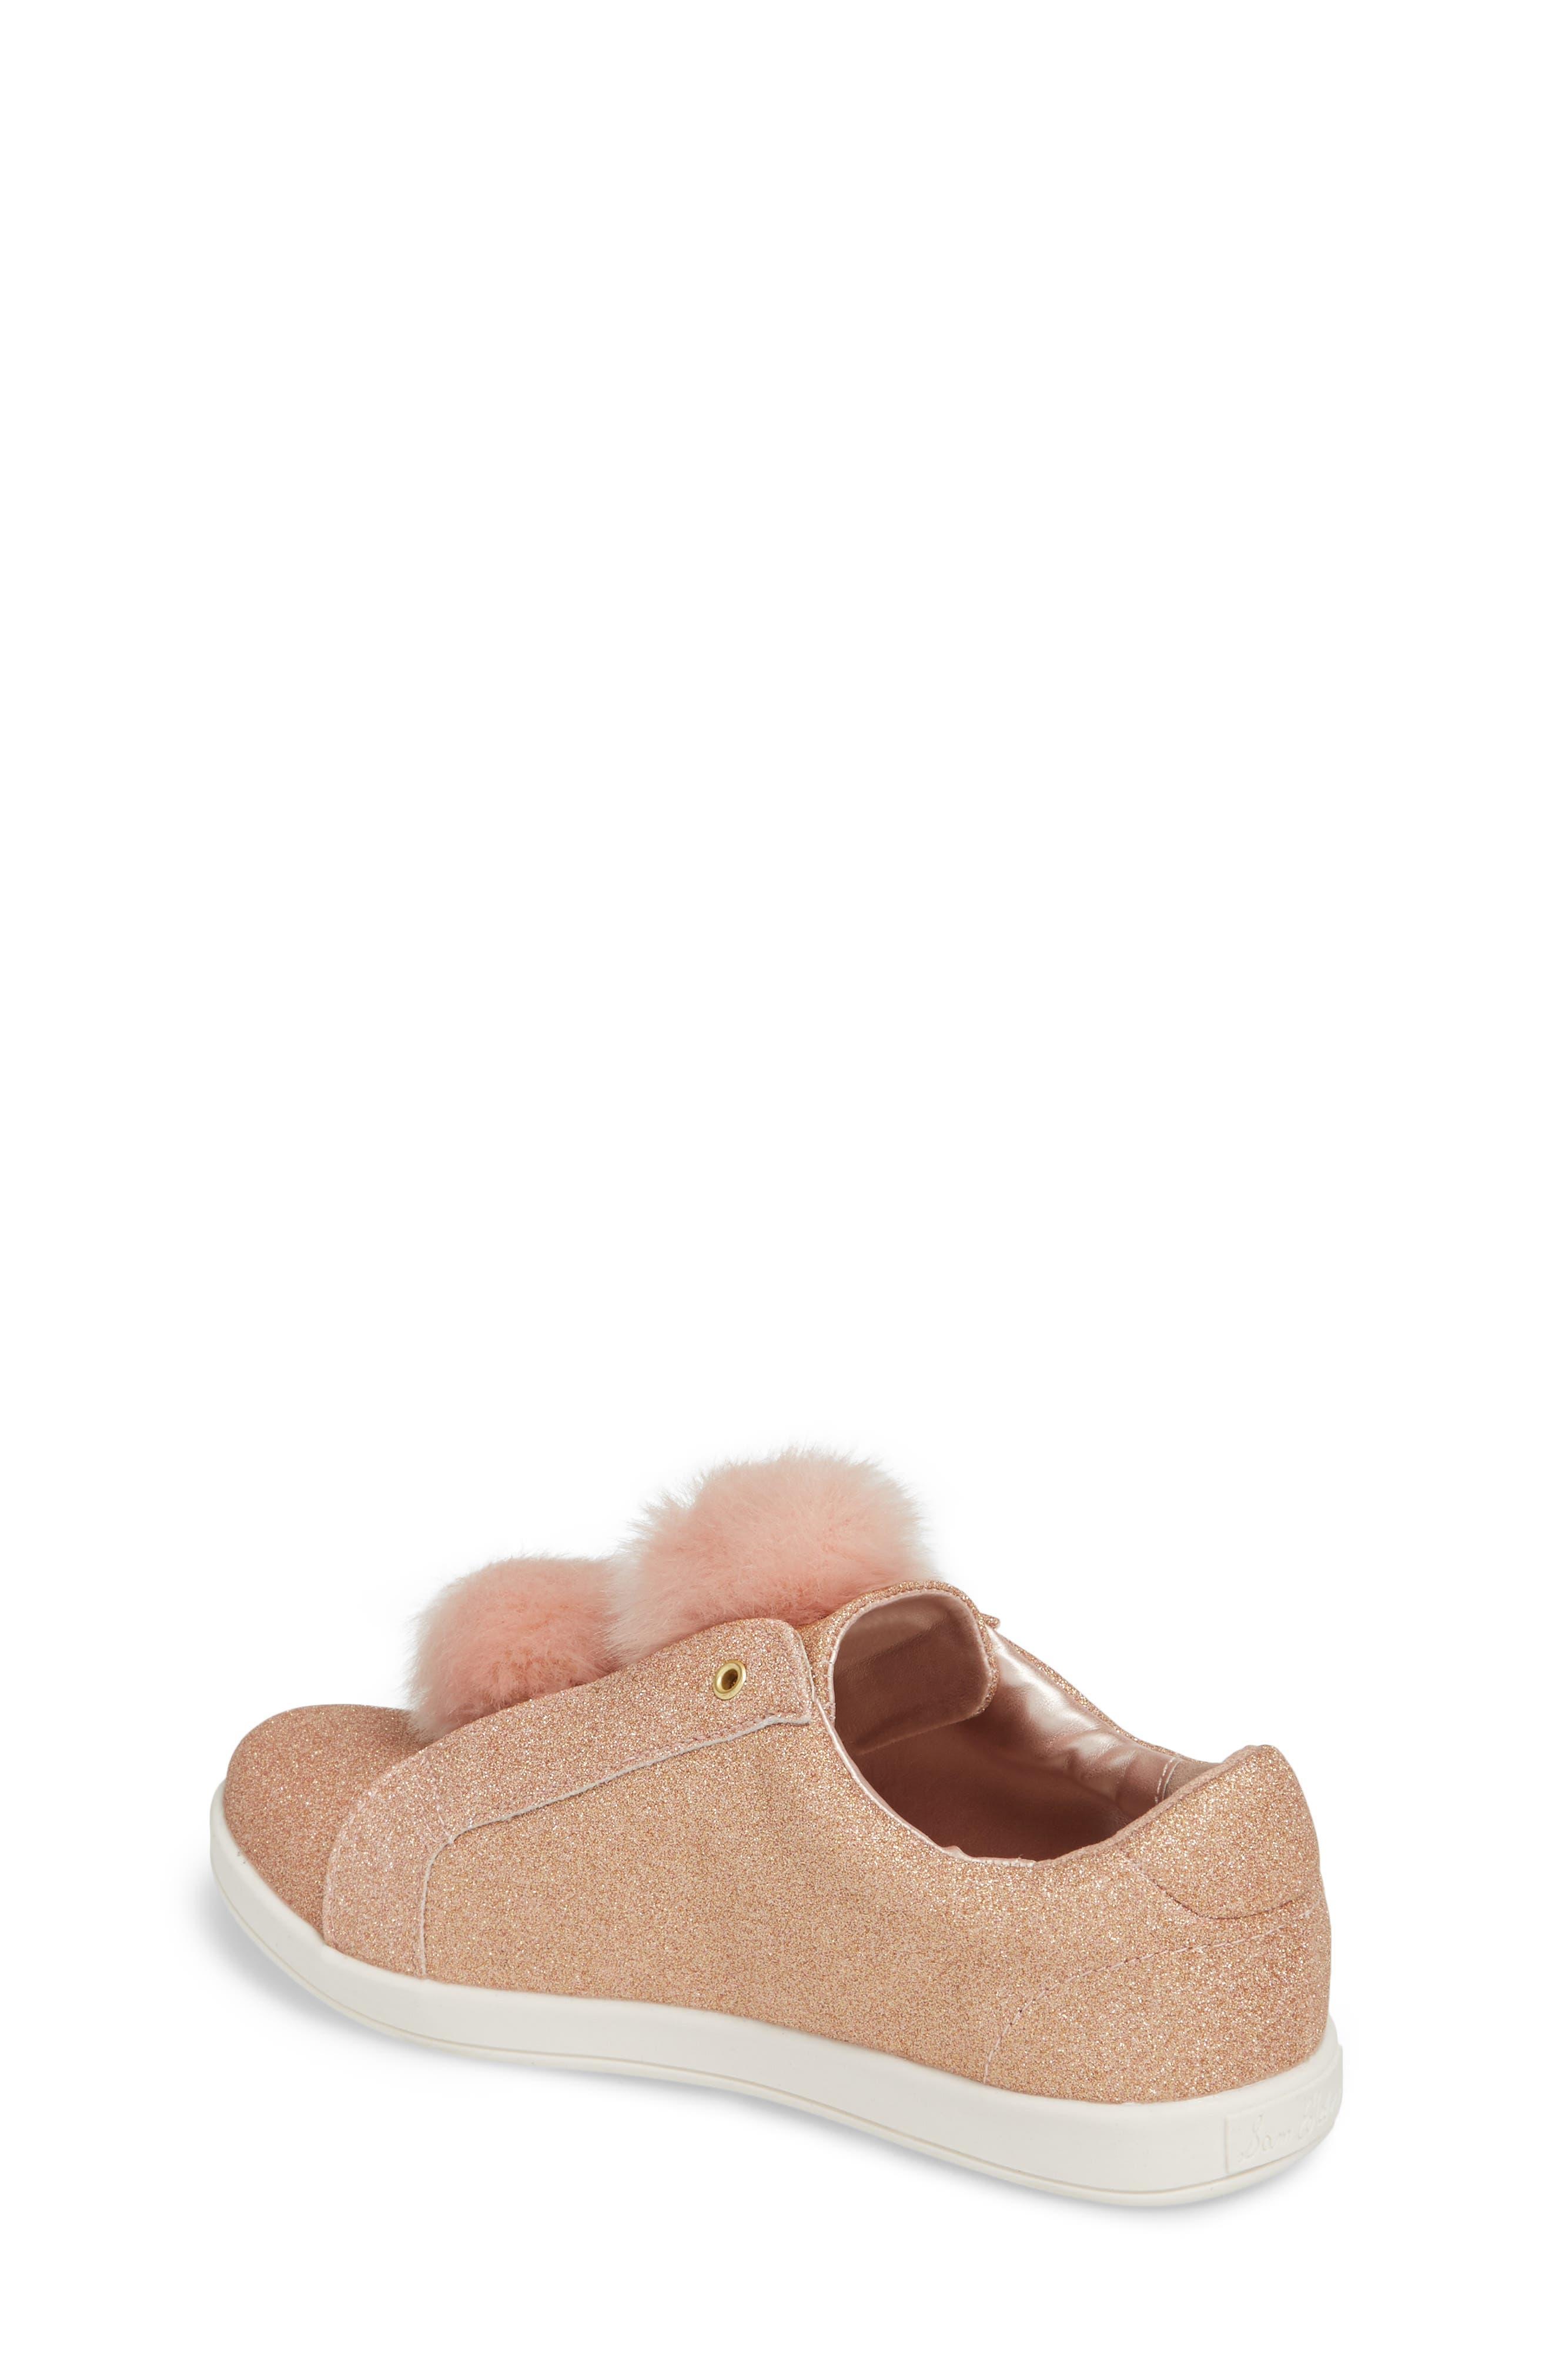 Alternate Image 2  - Sam Edelman Cynthia Leya Faux Fur Pompom Slip-On Sneaker (Toddler, Little Kid & Big Kid)